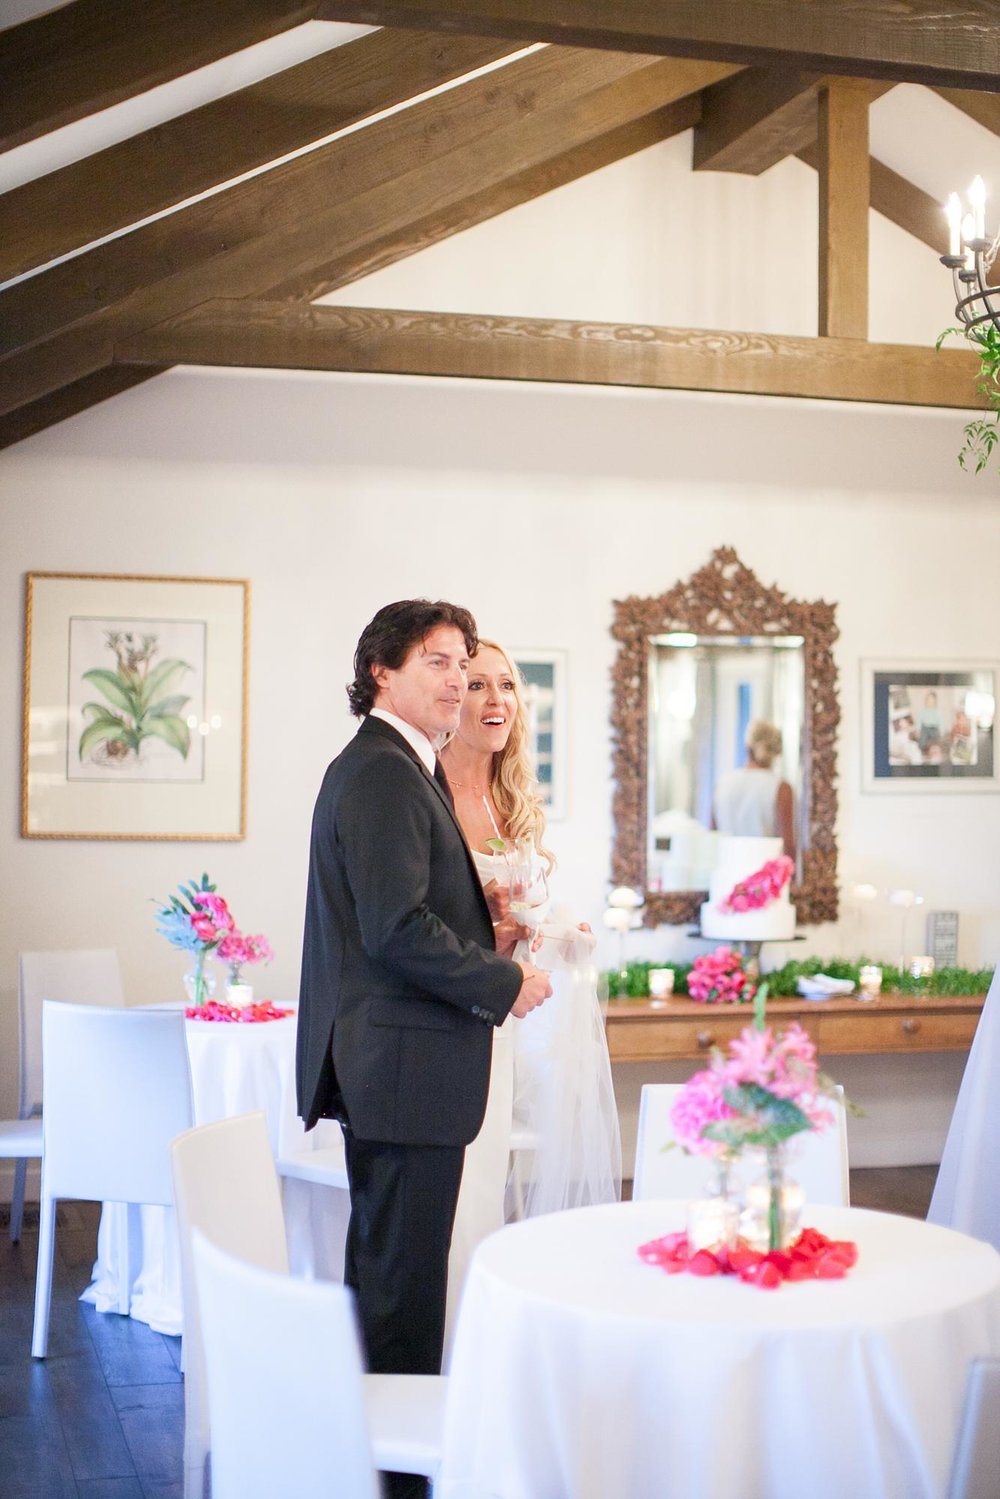 San Ysidro Ranch Wedding | Miki & Sonja Photography | mikiandsonja.com